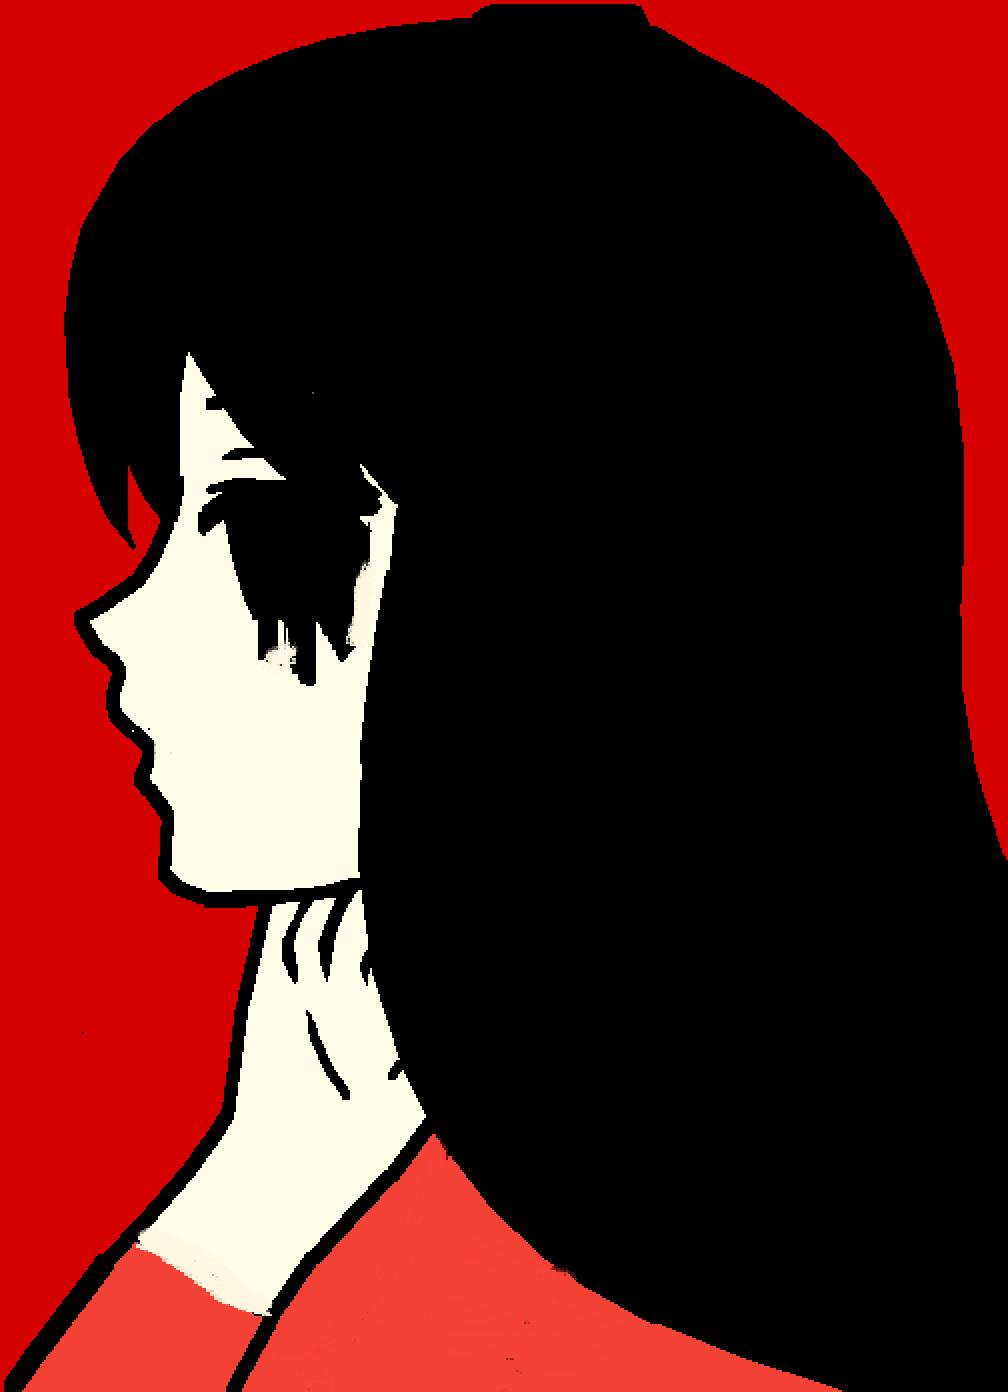 black eyed woman